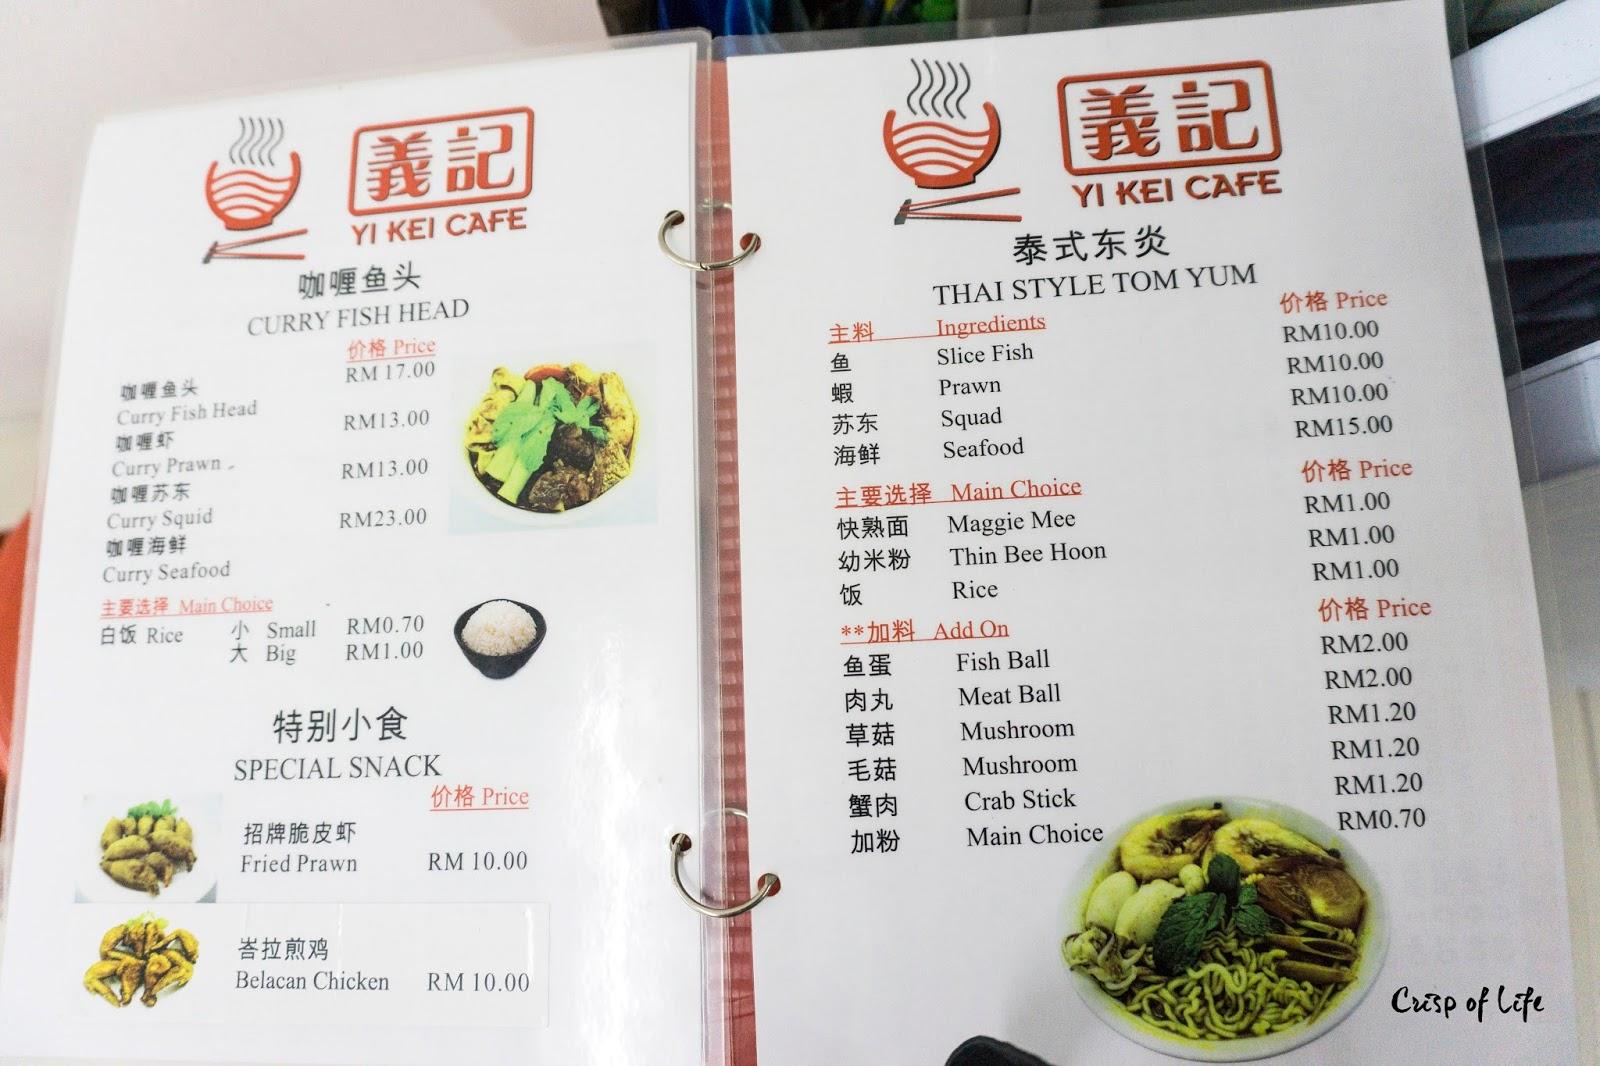 Yi Kei Kafe 義记 @ Perak Road, Penang